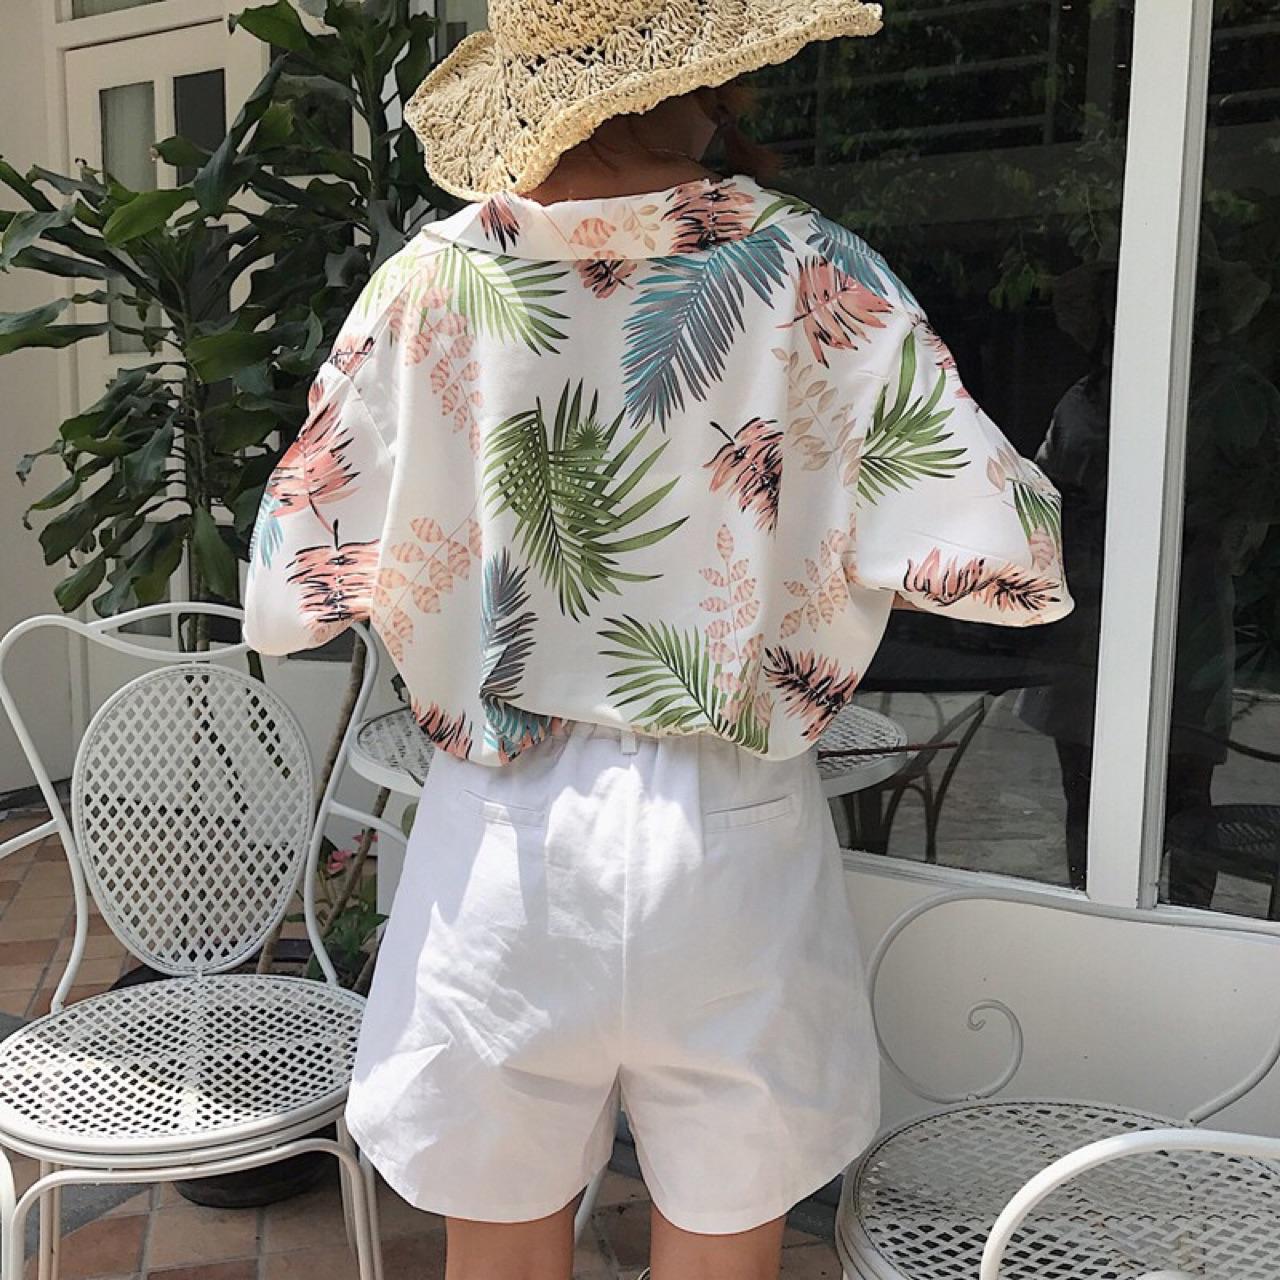 koreanstyle,koreanfashion,shirt,hawaiishirt,hawaii,party,casual,workwear,streetstyle,streetfashion,floral,leaf,loosetop,ruffle,basictypes,เสื้อผ้าผู้หญิง,เสื้อผู้หญิง,เสื้อเชิ้ตผู้หญิง,เสื้อเชิ้ตแขนสั้น,เสื้อเชิ้ตฮาวาย,เสื้อฮาวาย,ฮาวาย